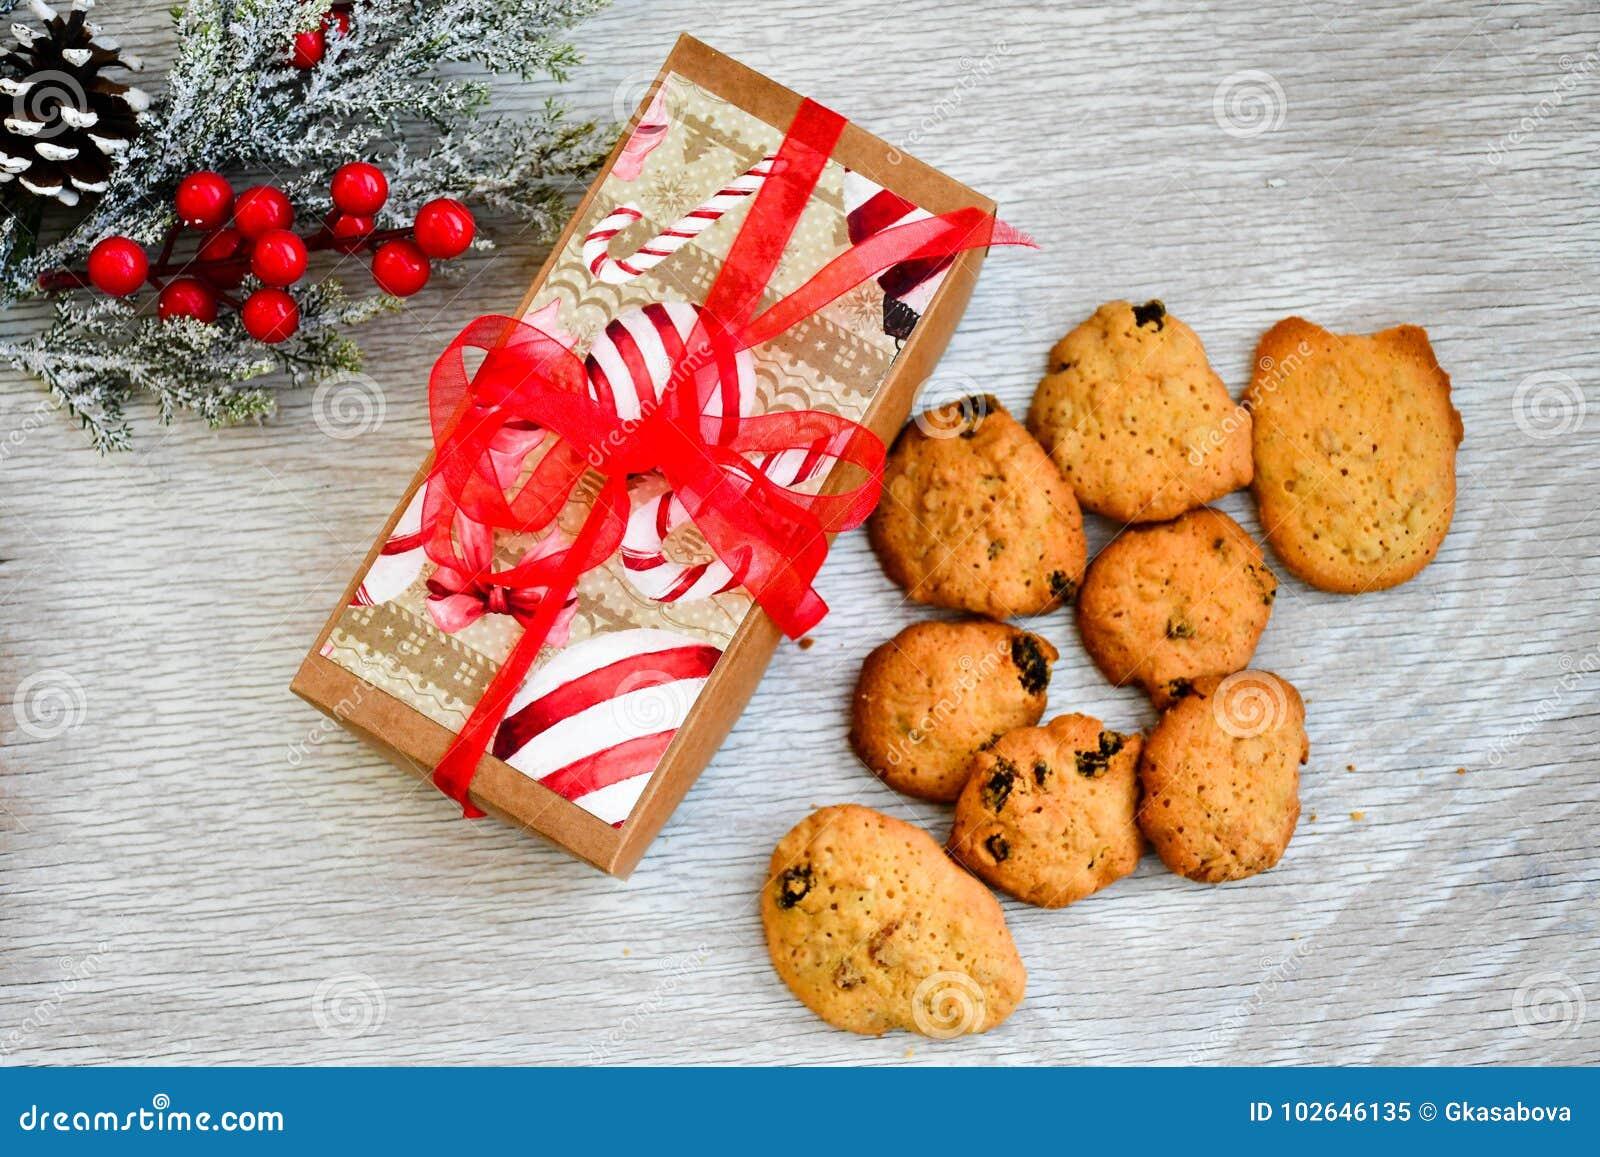 Christmas Cookies stock image. Image of calendar, balls - 102646135